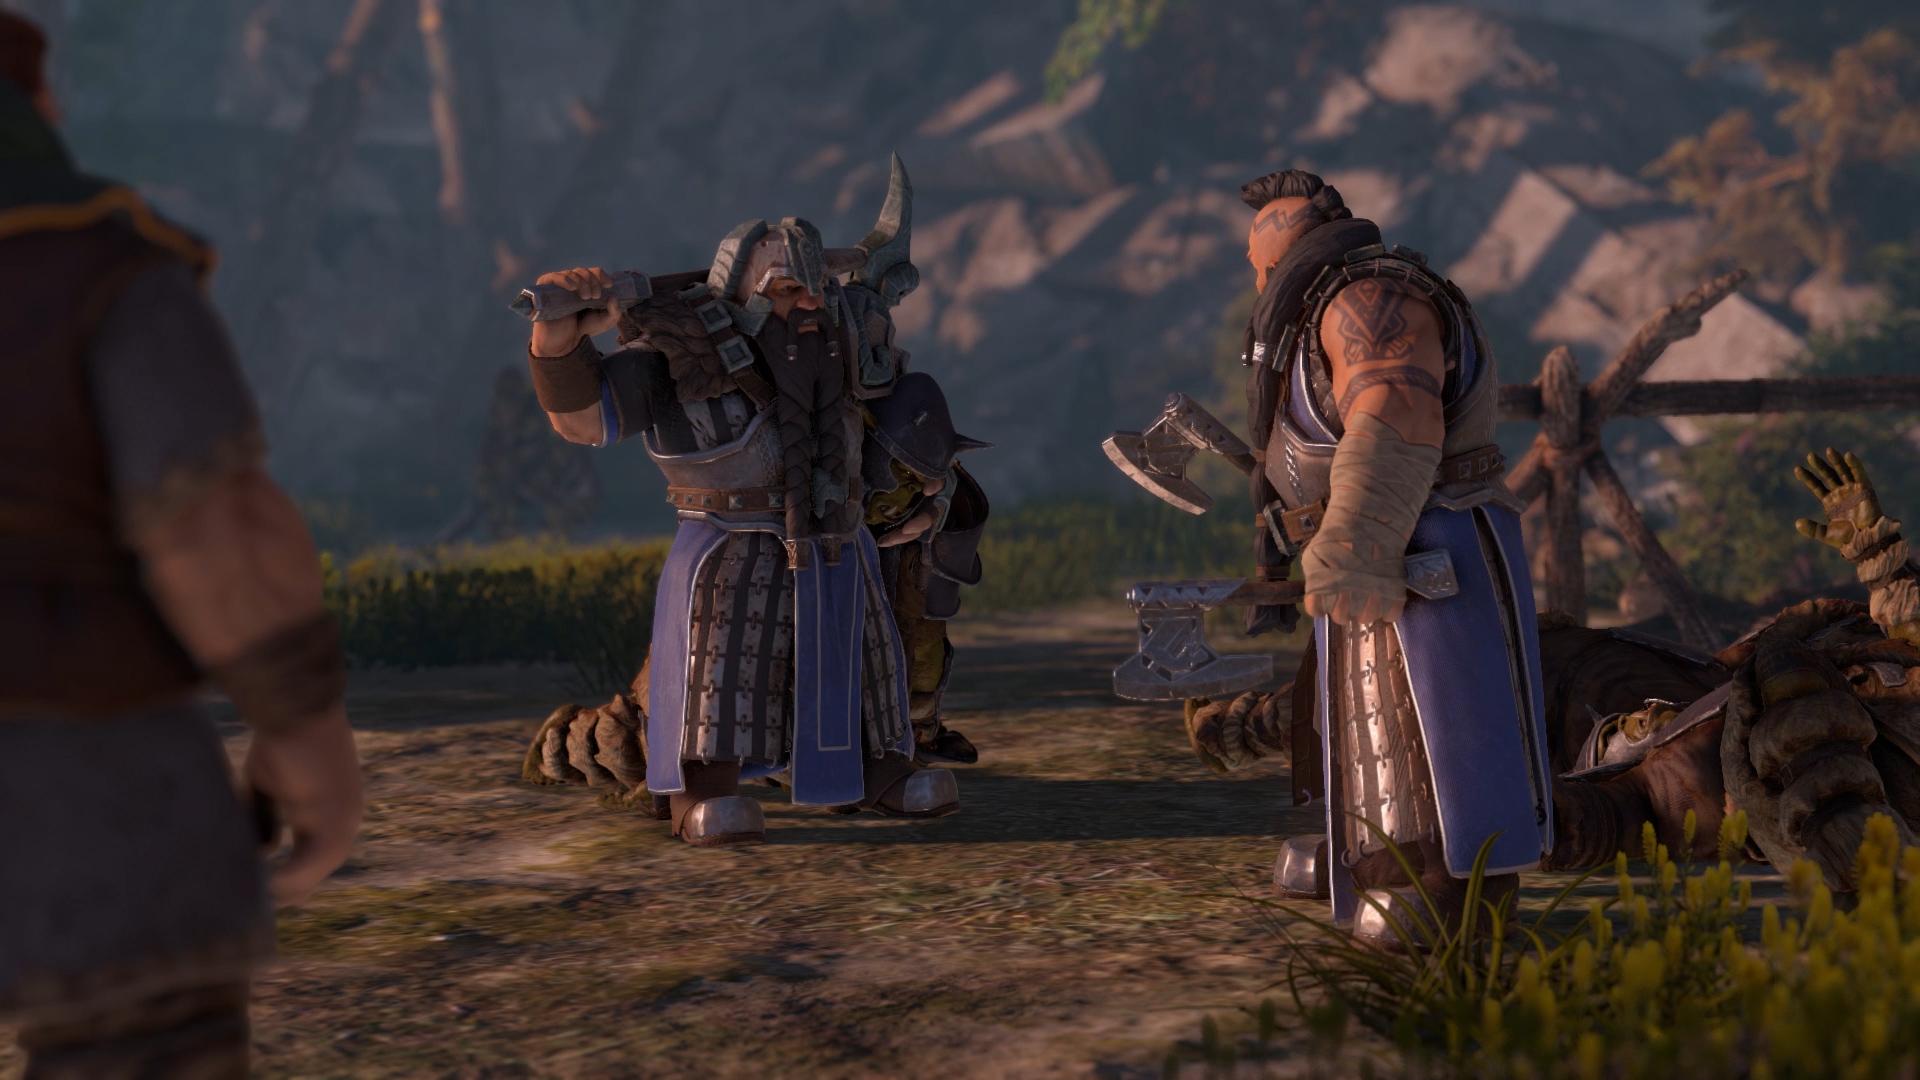 the dwarves thq nordic gmbh